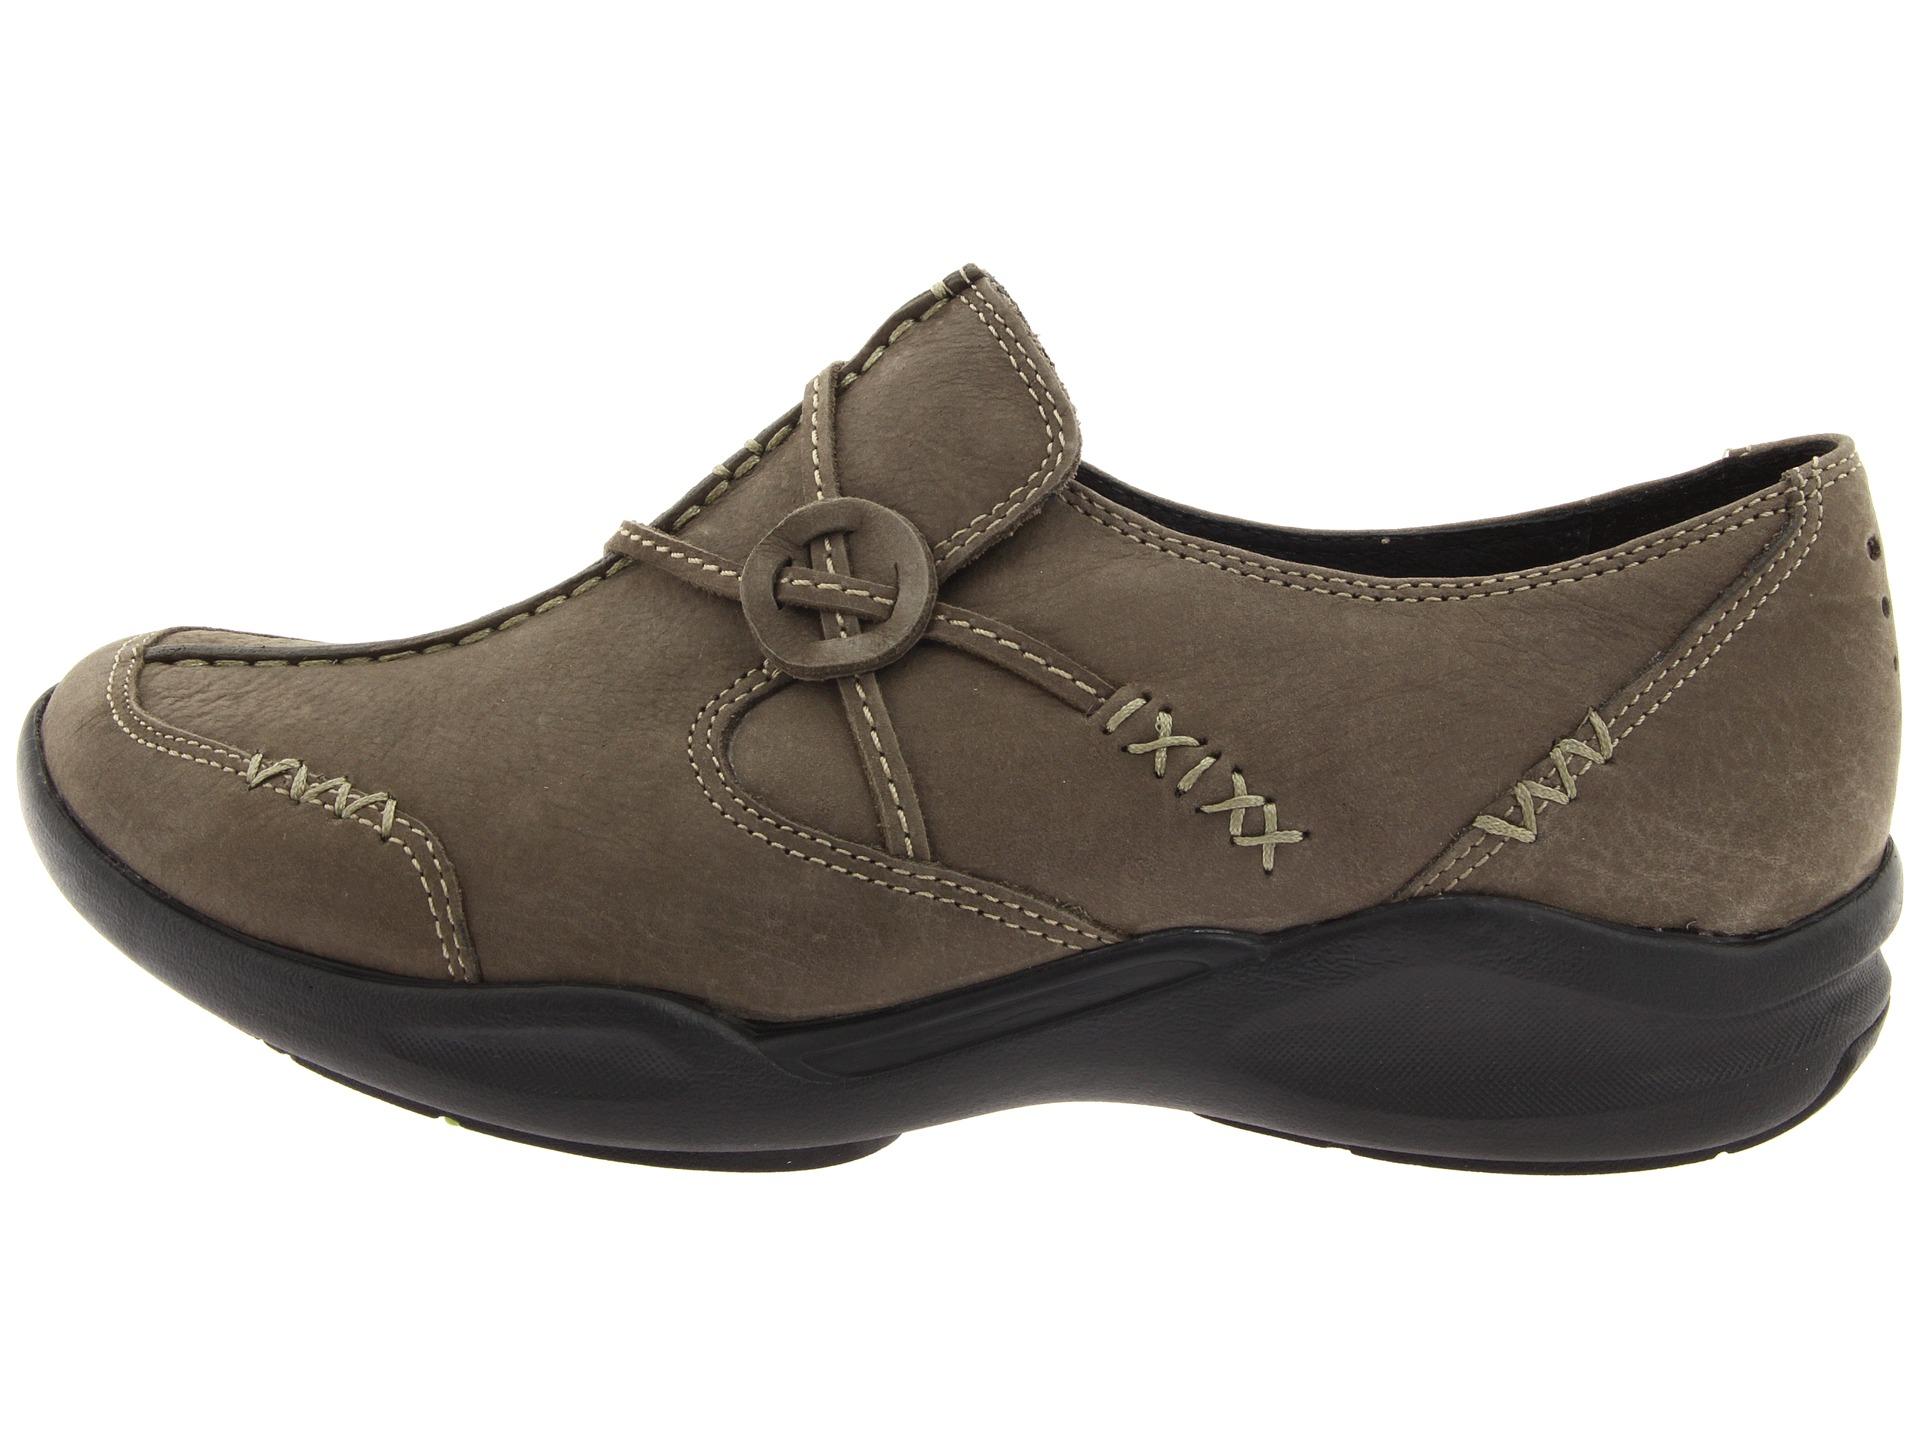 Clarks Wave Run Womens Shoes